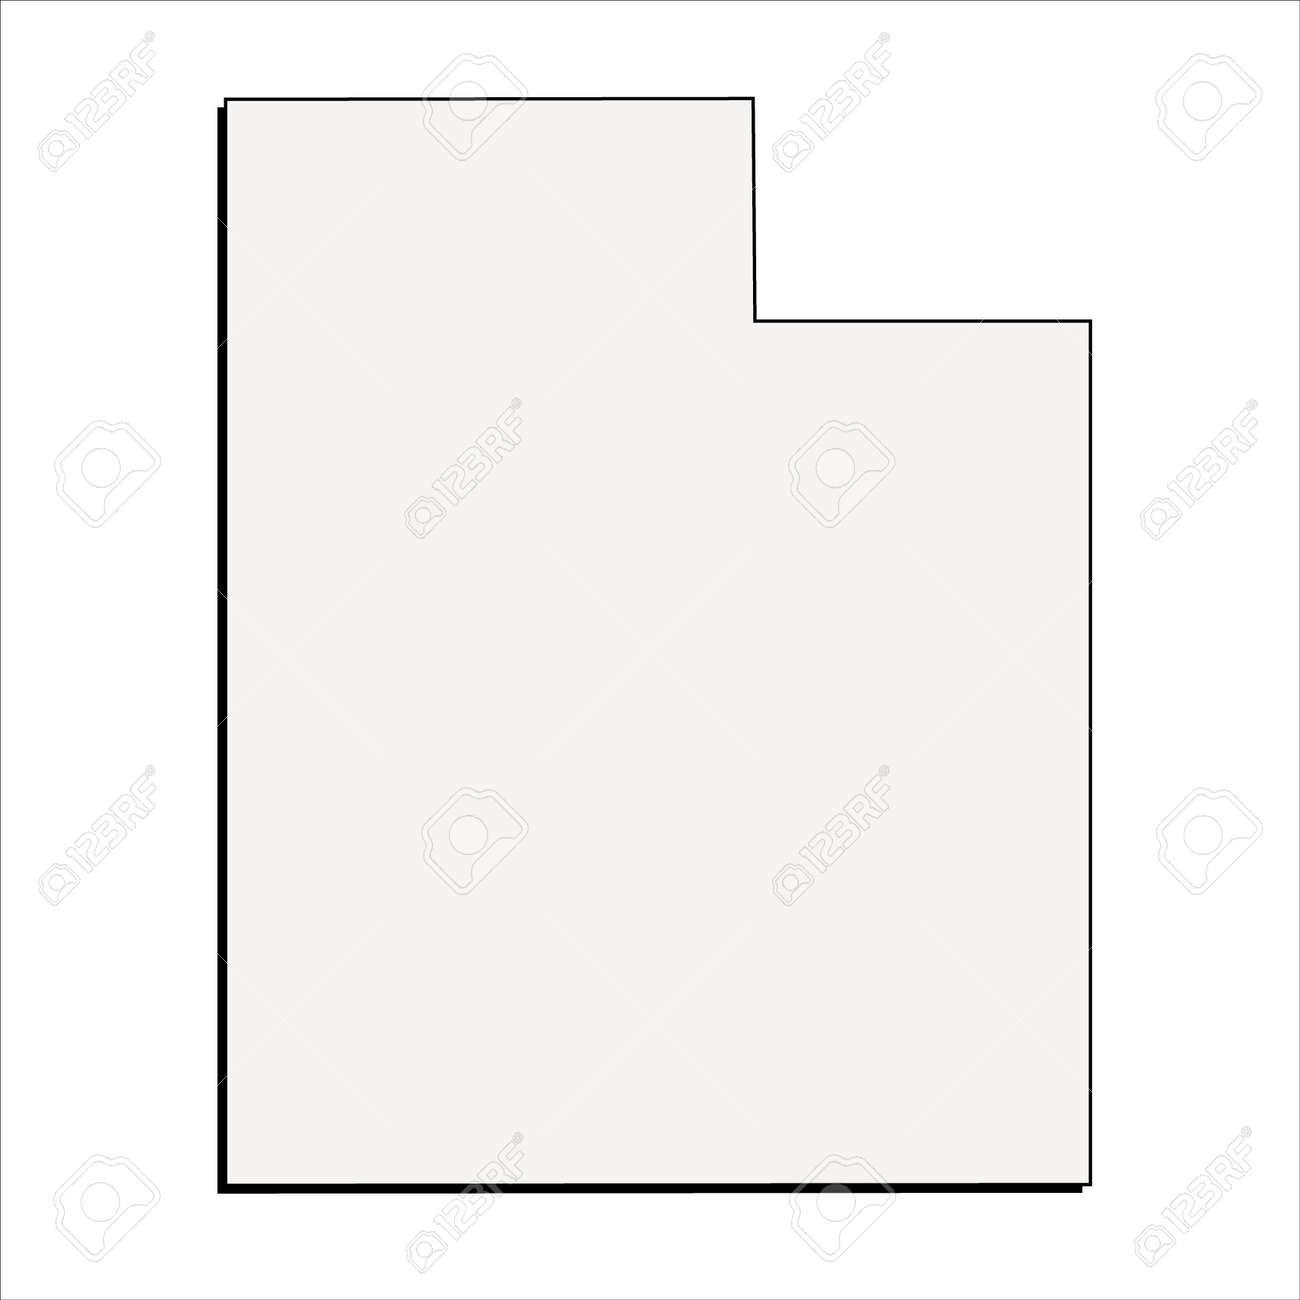 Vector Utah State 3D Outline Map - 58605348